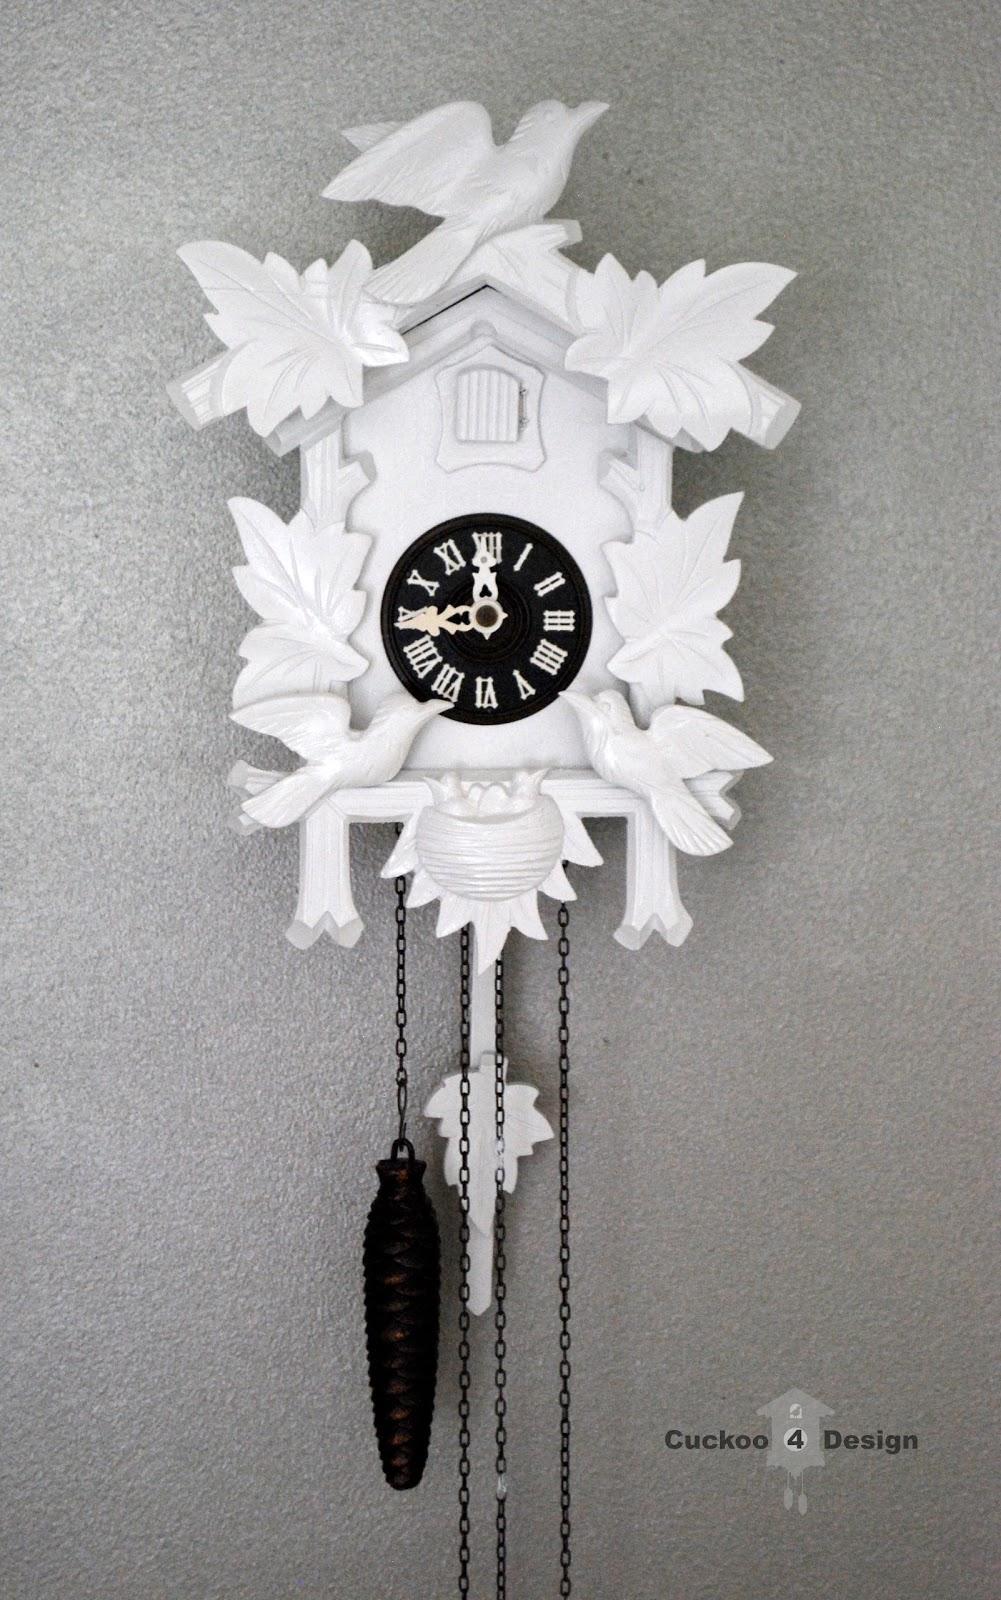 Painted cuckoo clocks cuckoo4design painted cuckoo clocks amipublicfo Image collections